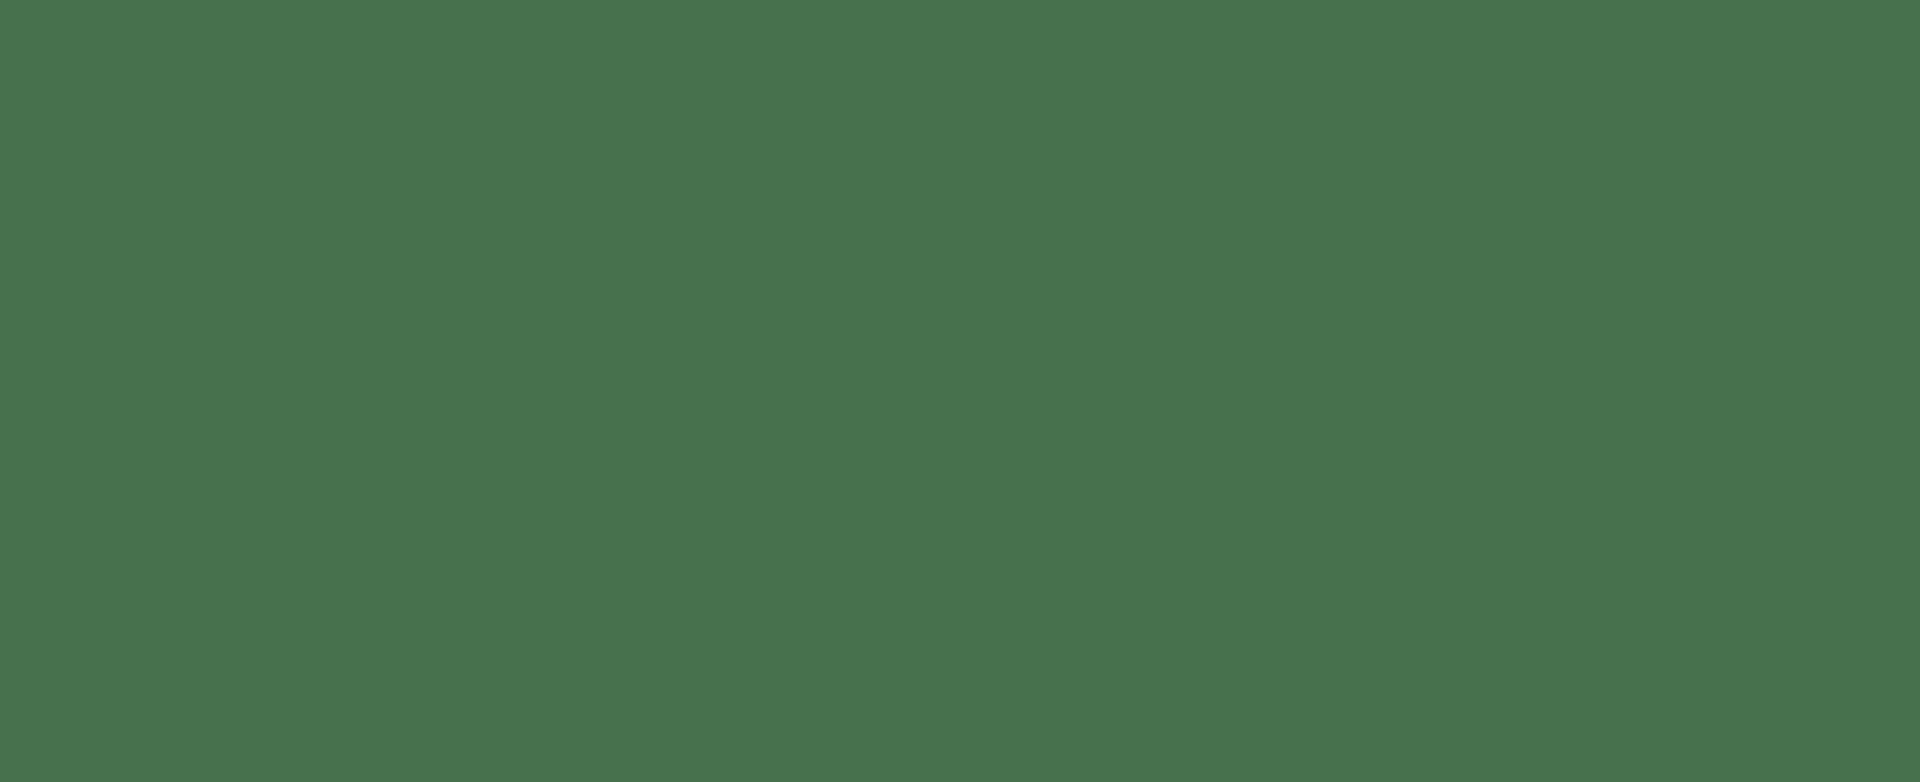 Aircraft Operators | aviation operations & fleet tracking